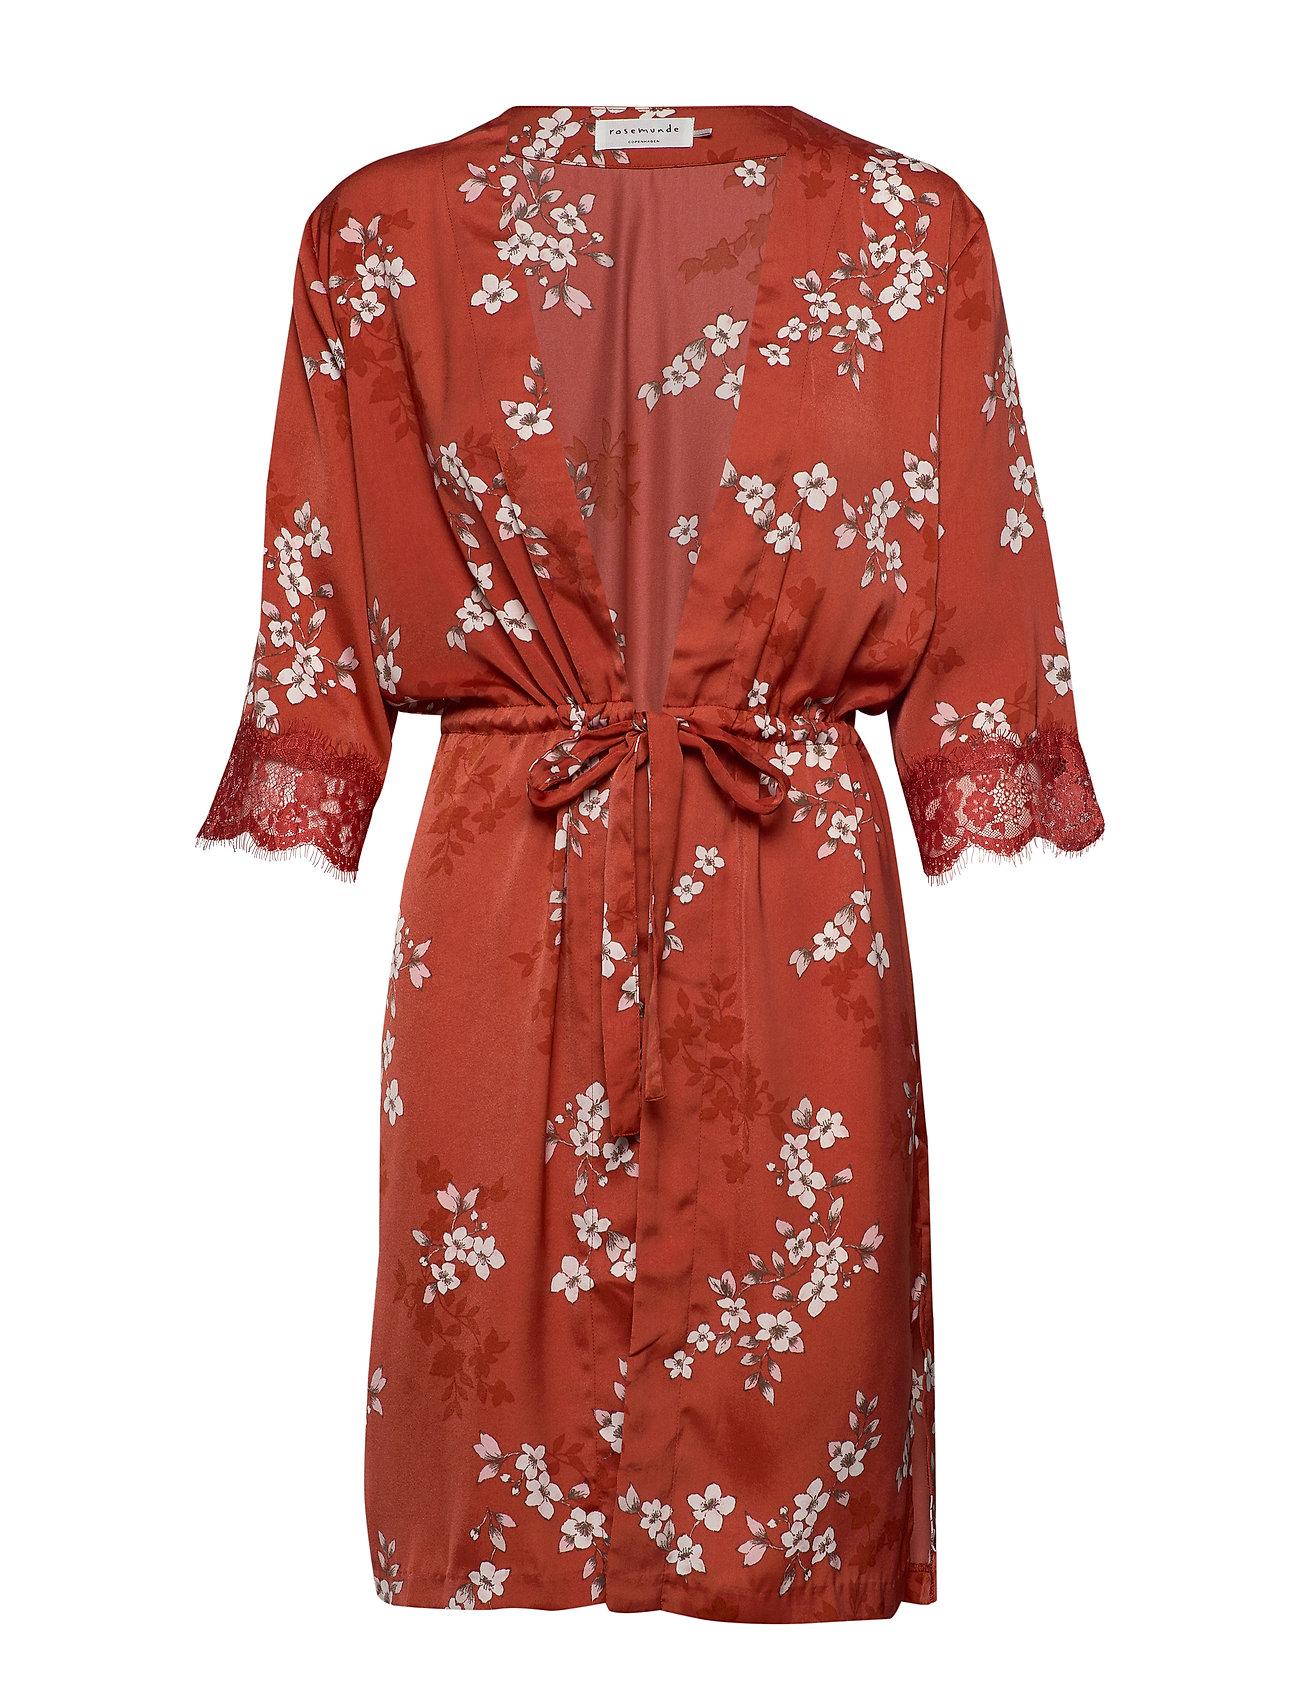 Rosemunde Jacket 3/4 s - RED CHERRY BLOOM PRINT